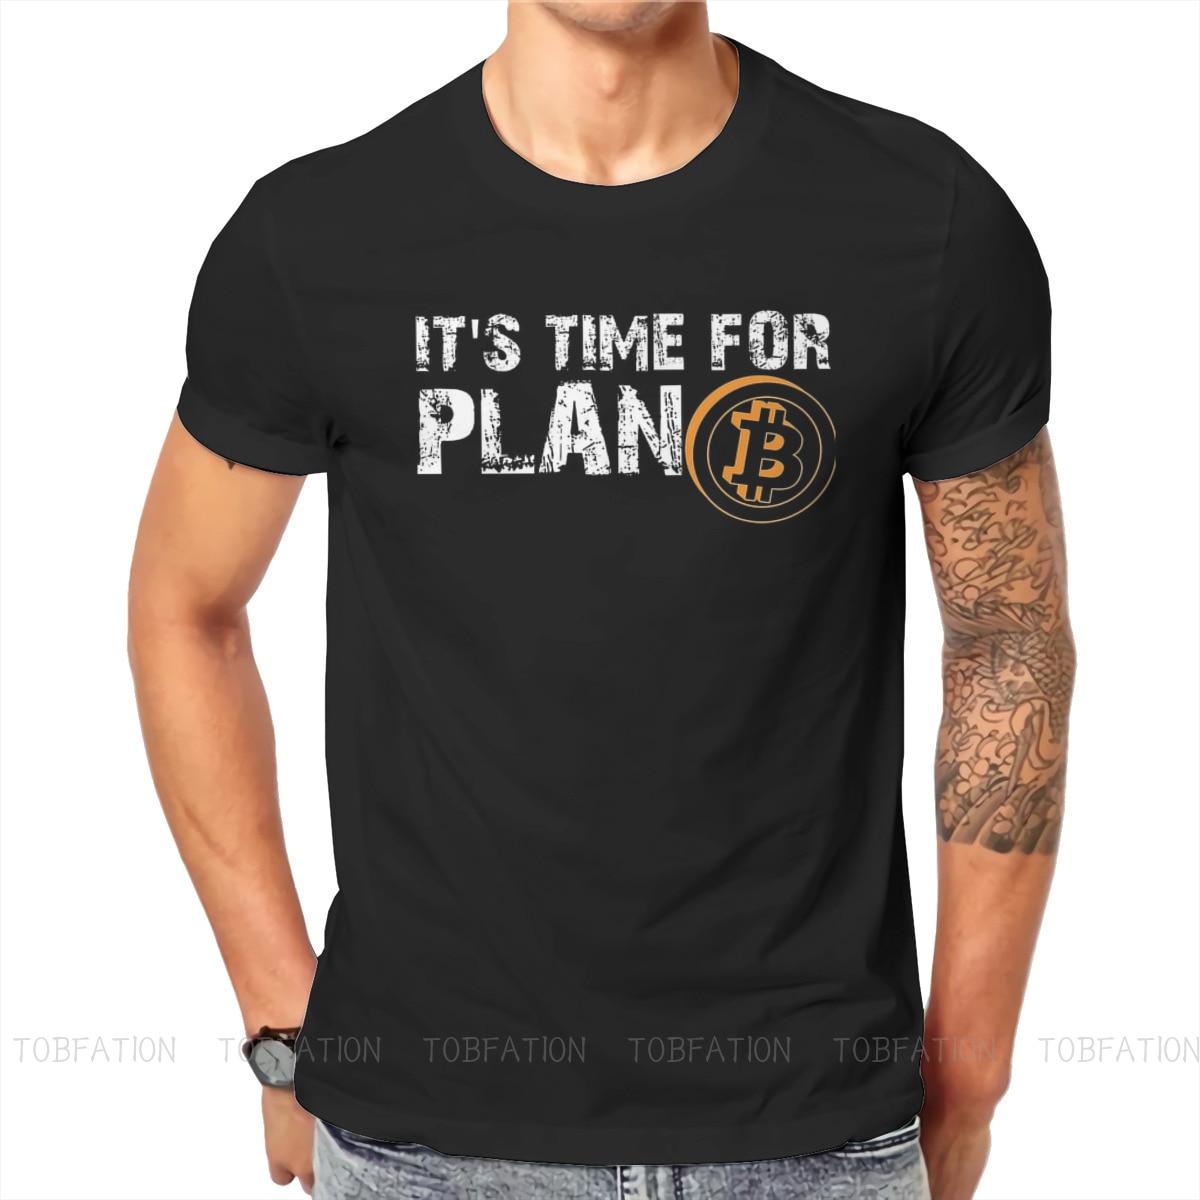 Bitcoin Art Satoshi Nakamoto It's Time For Plan B TShirt Men Gothic Big Size Casual Crewneck Cotton T Shirt 2020 1